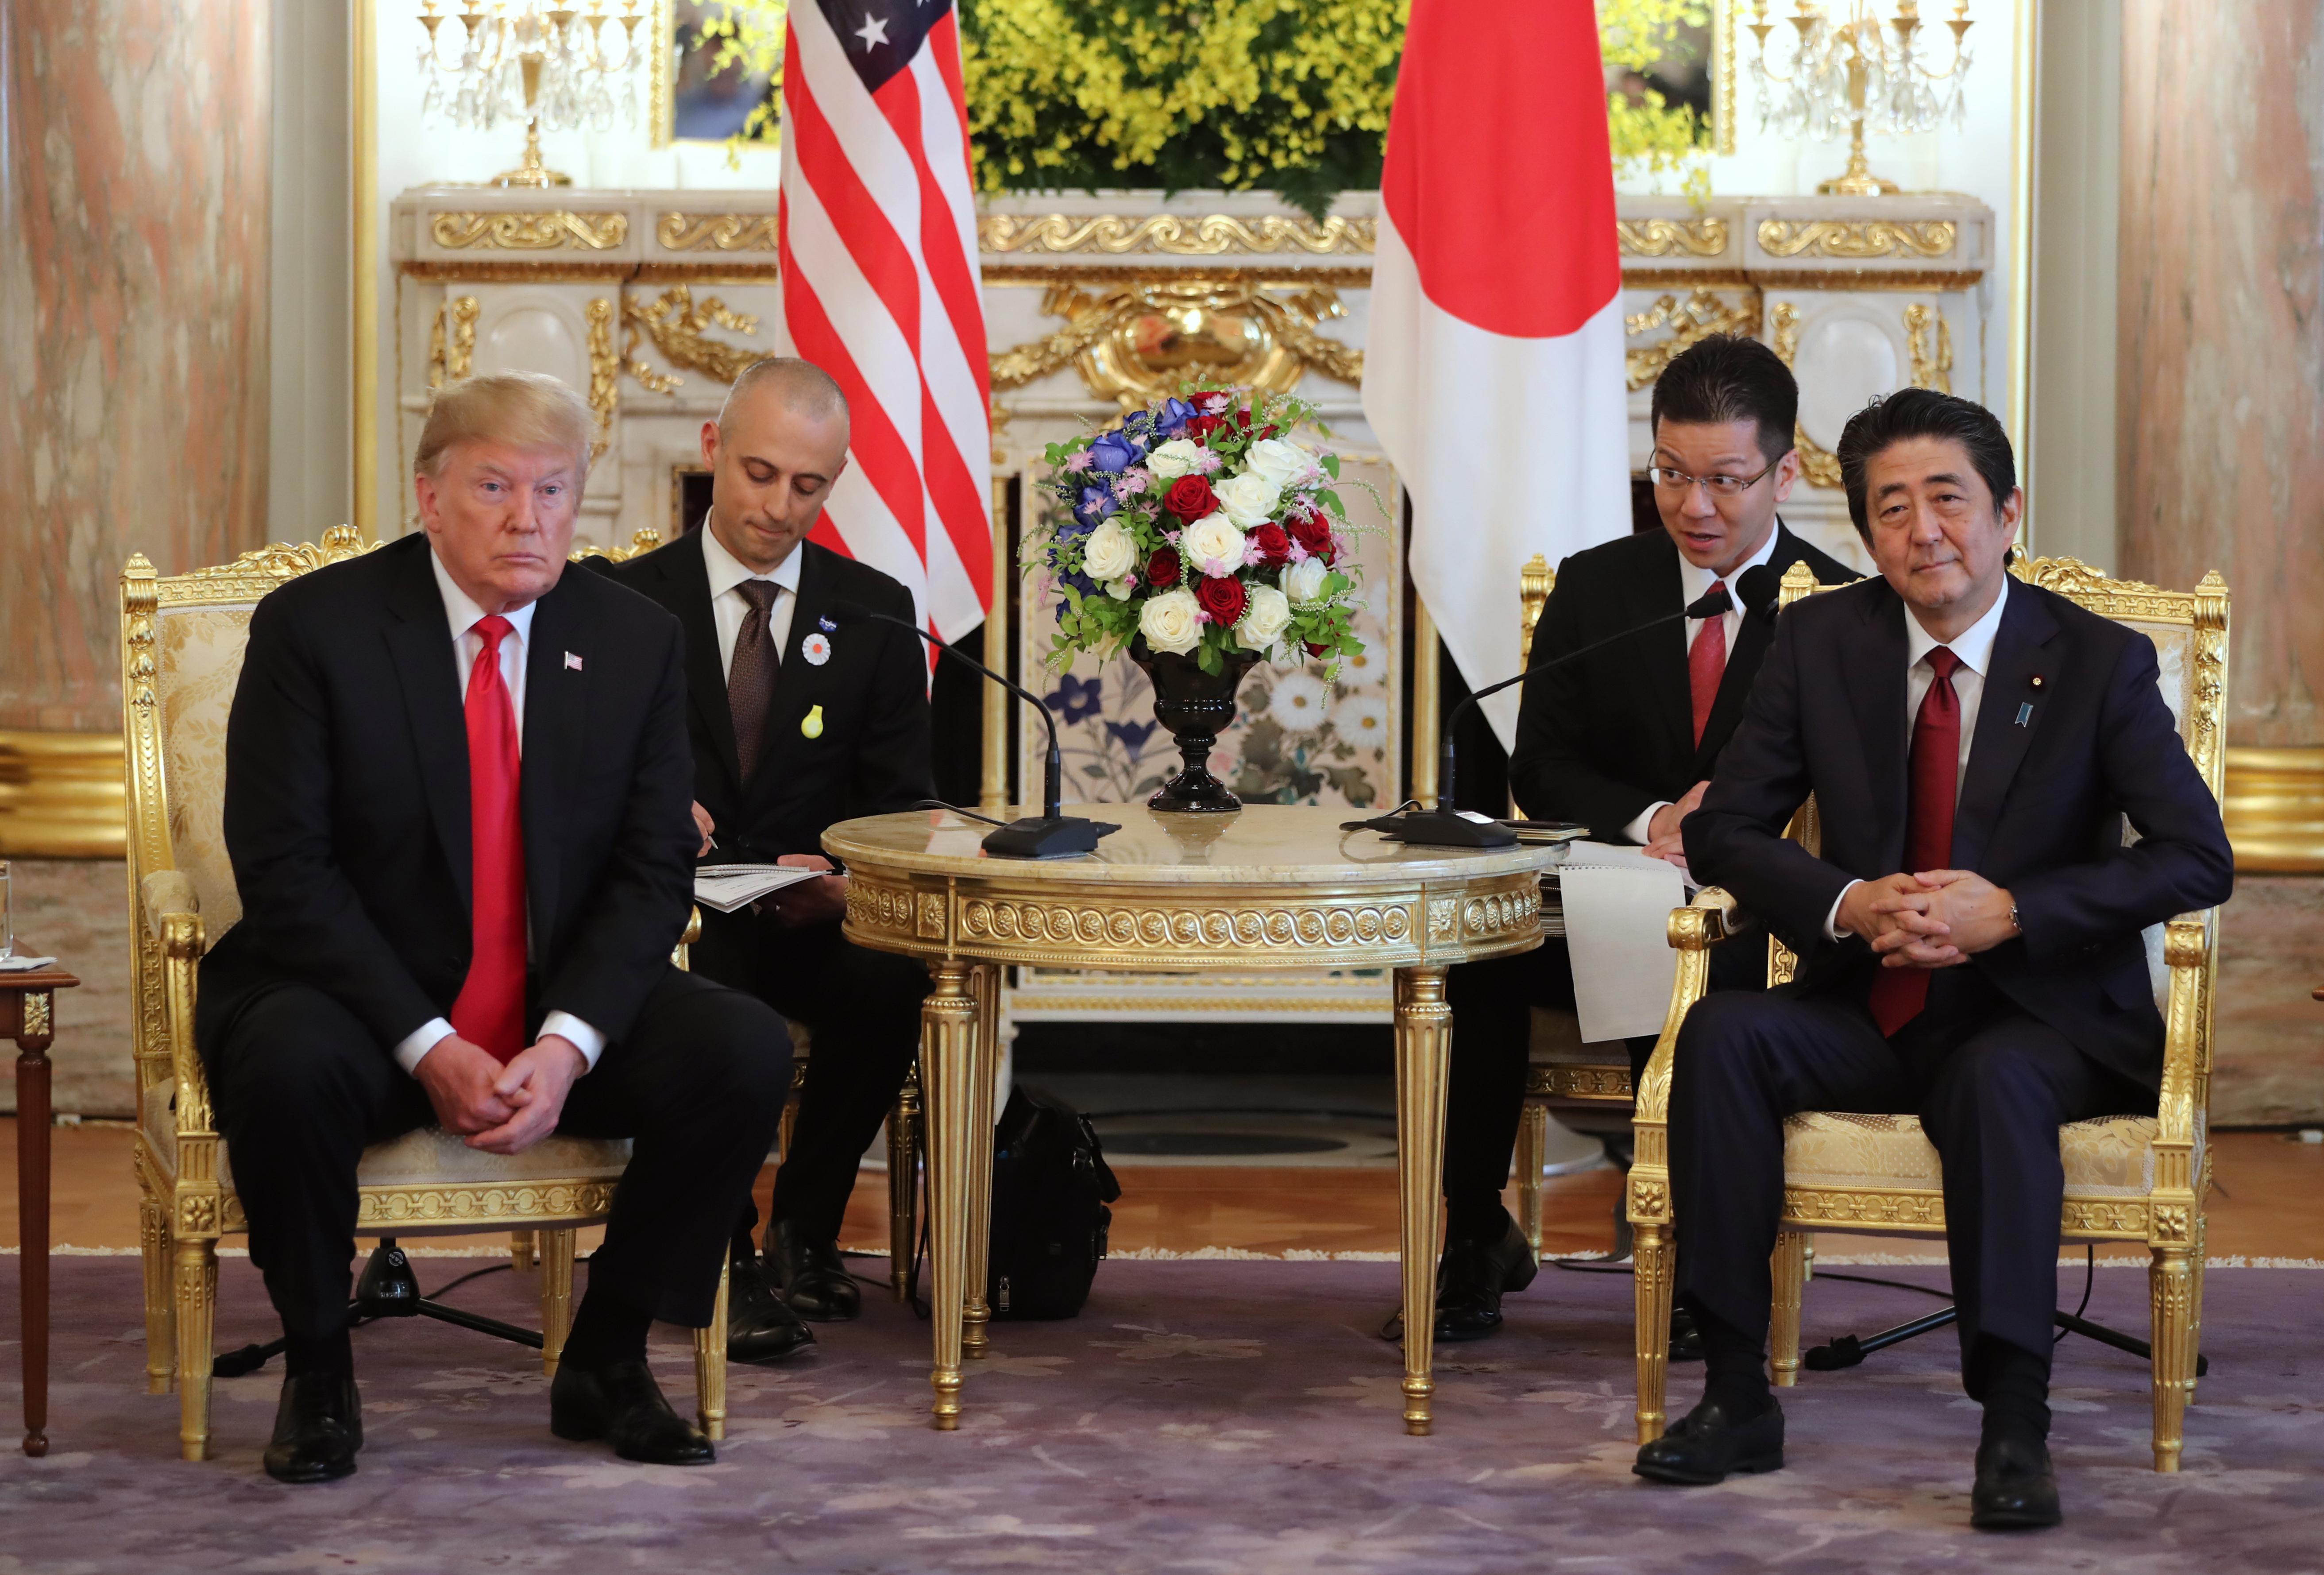 US President Donald Trump, left, and Japanese Prime Minister Shinzo Abe at Akasaka Palace on May 27, 2019 in Tokyo, Japan.